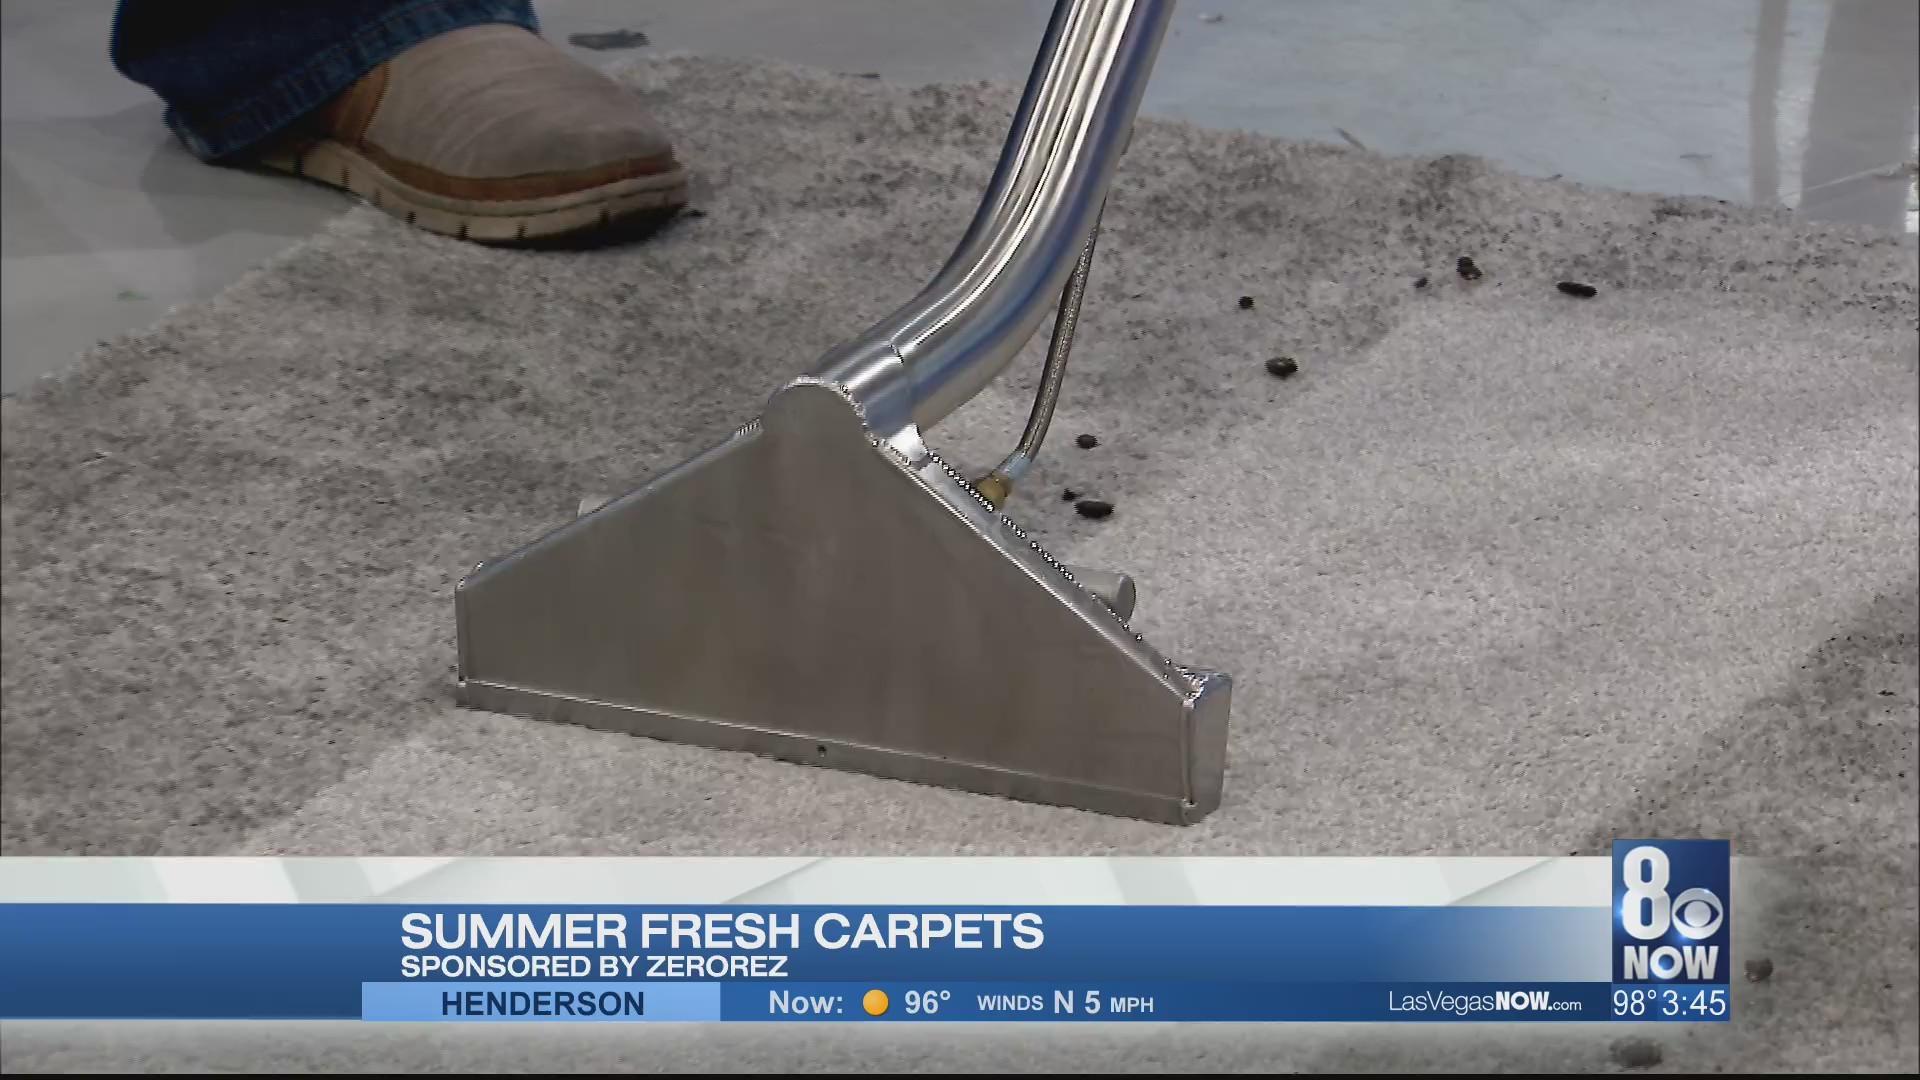 Summer fresh carpets with Zerorez